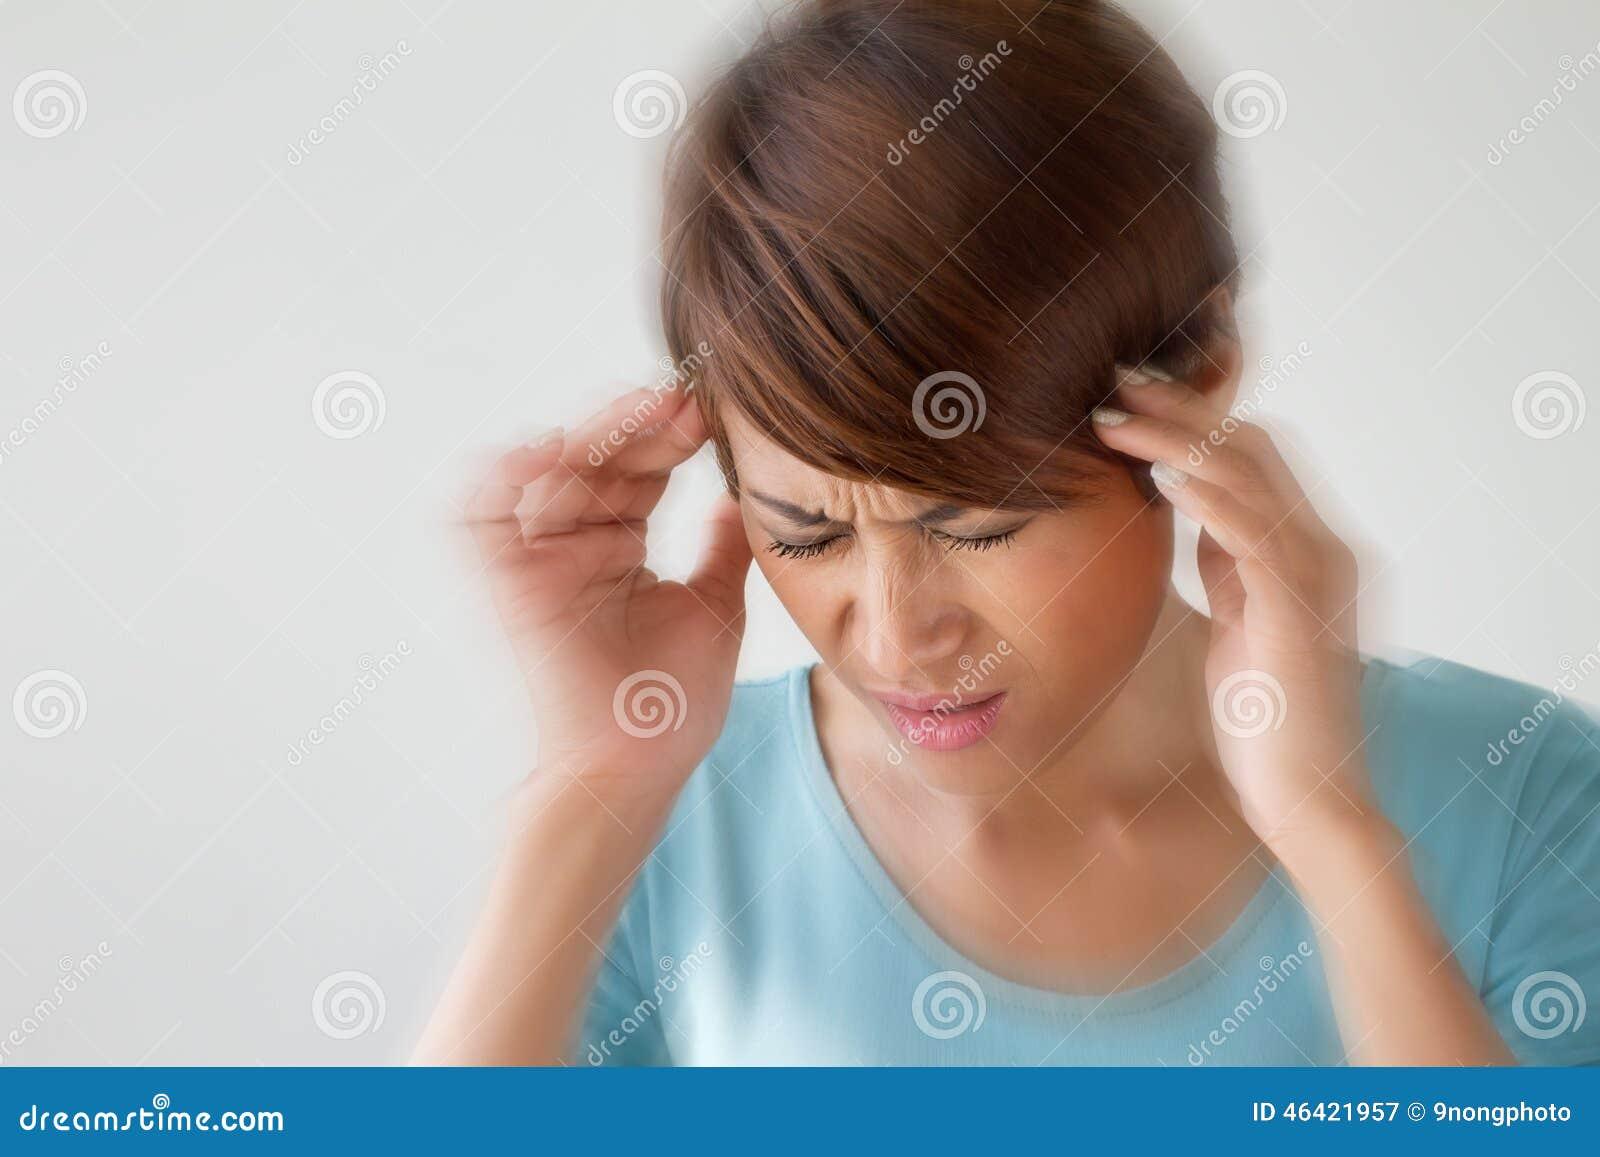 Kobieta cierpi od bólu, migrena, choroba, migrena, stres